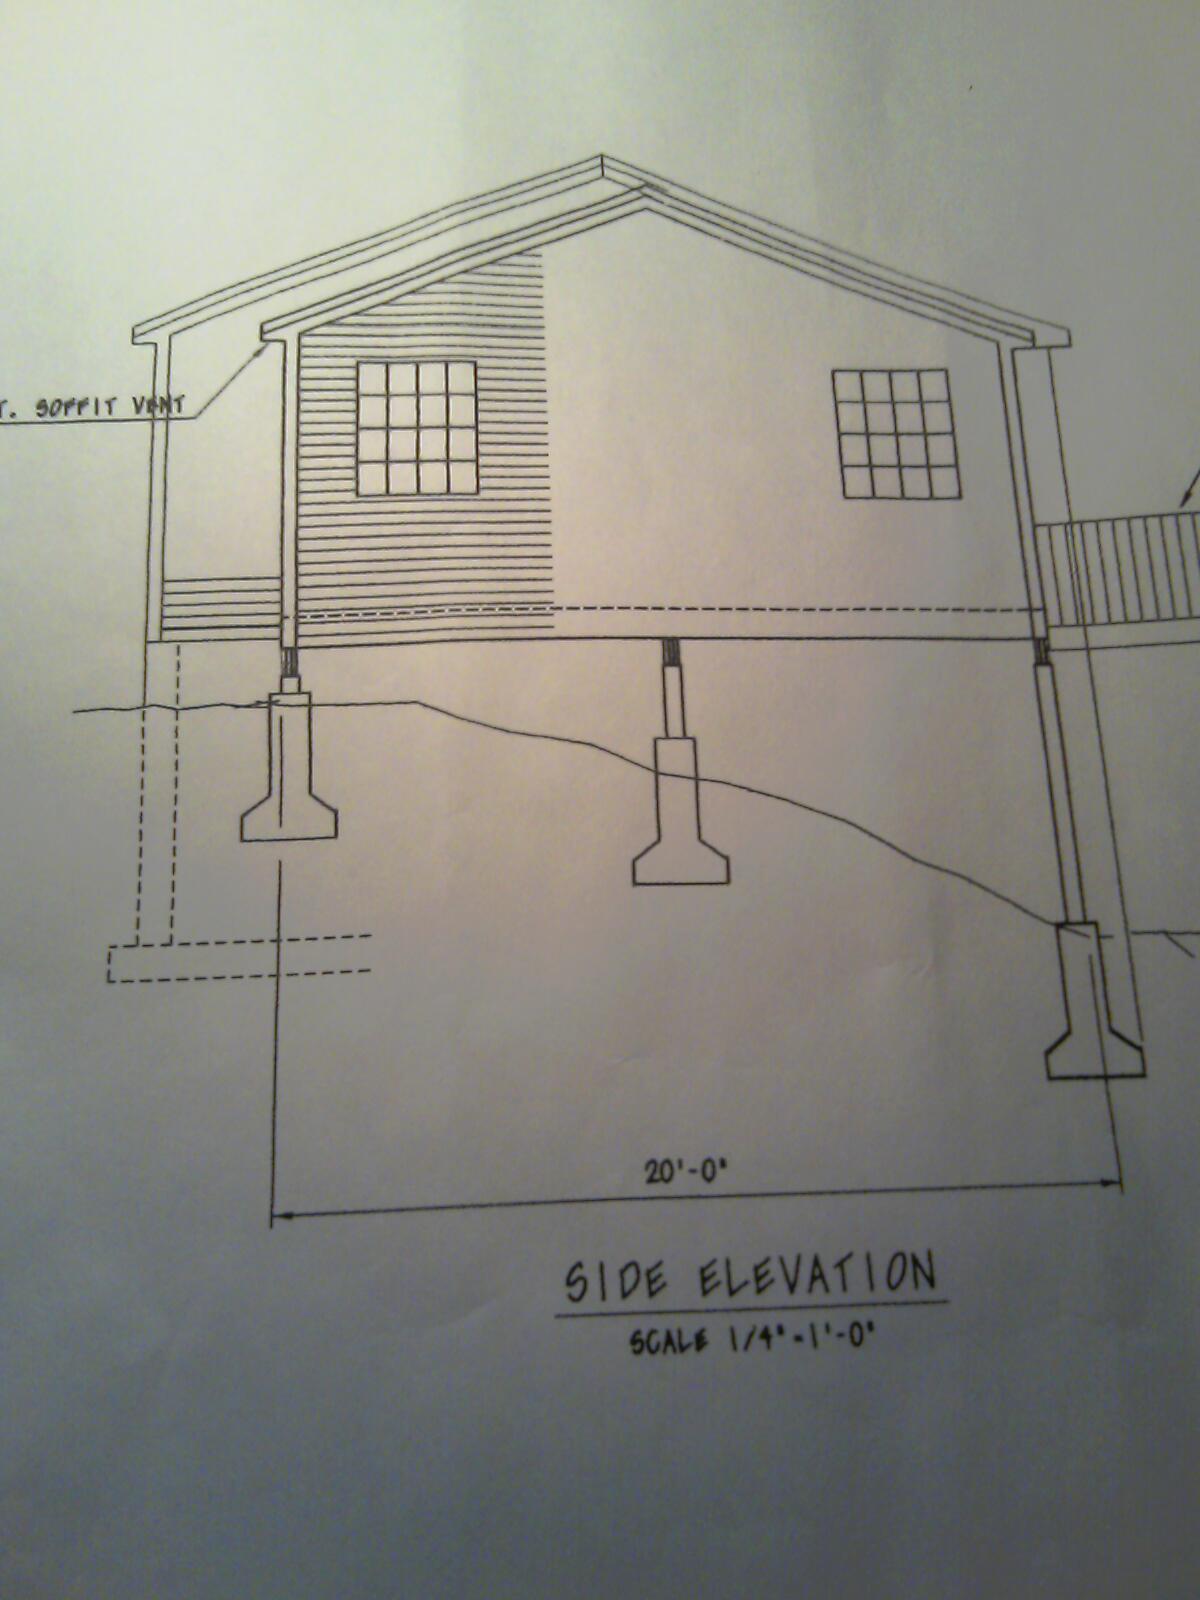 Sun room shear wall requirements?-nardi-plans.jpg